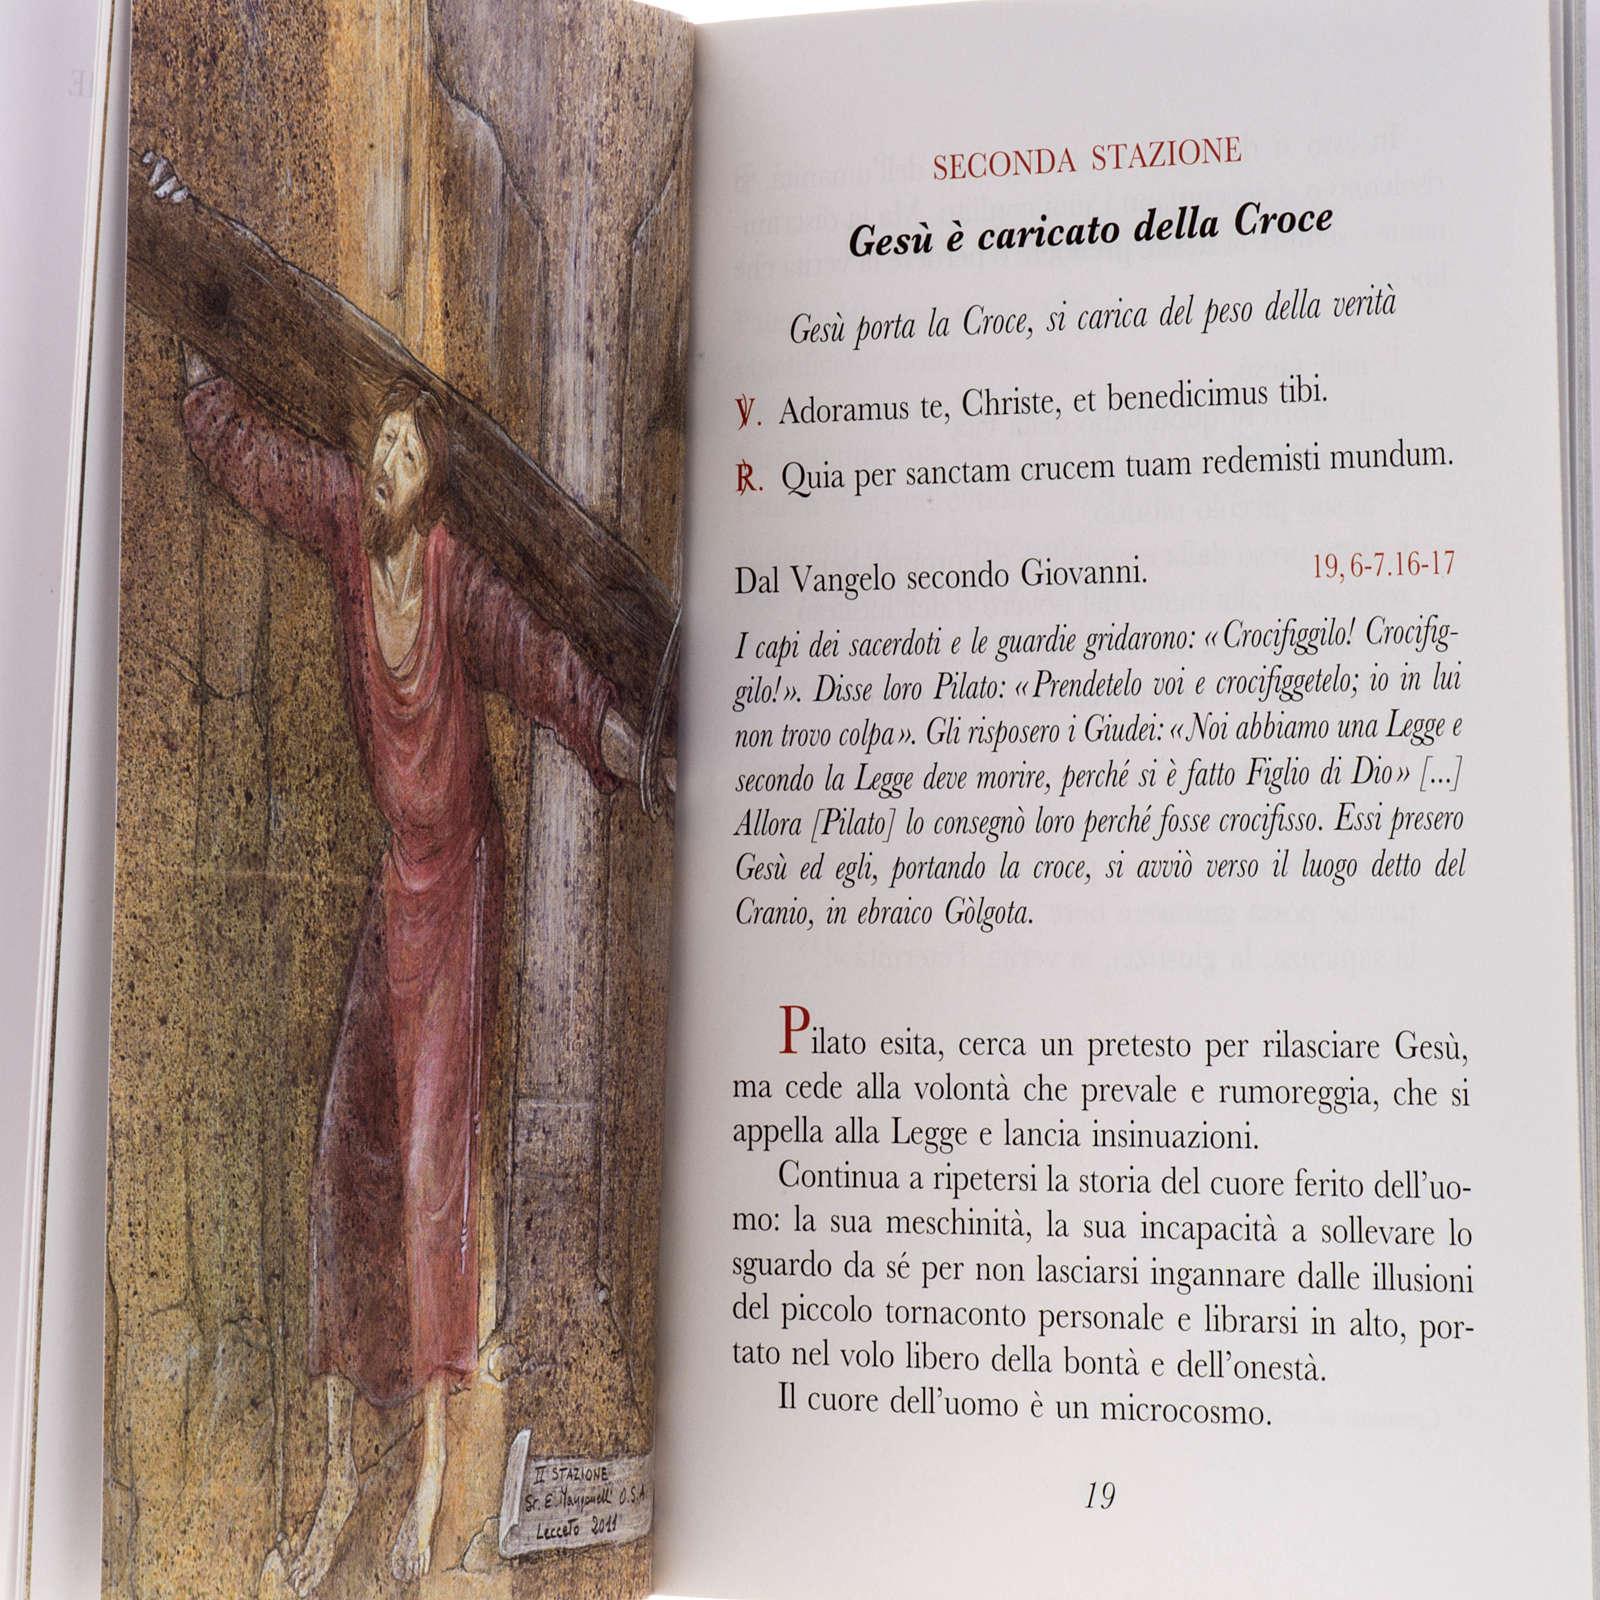 Via Crucis al Colosseo presieduta dal Santo Padre Benedetto XVI 4